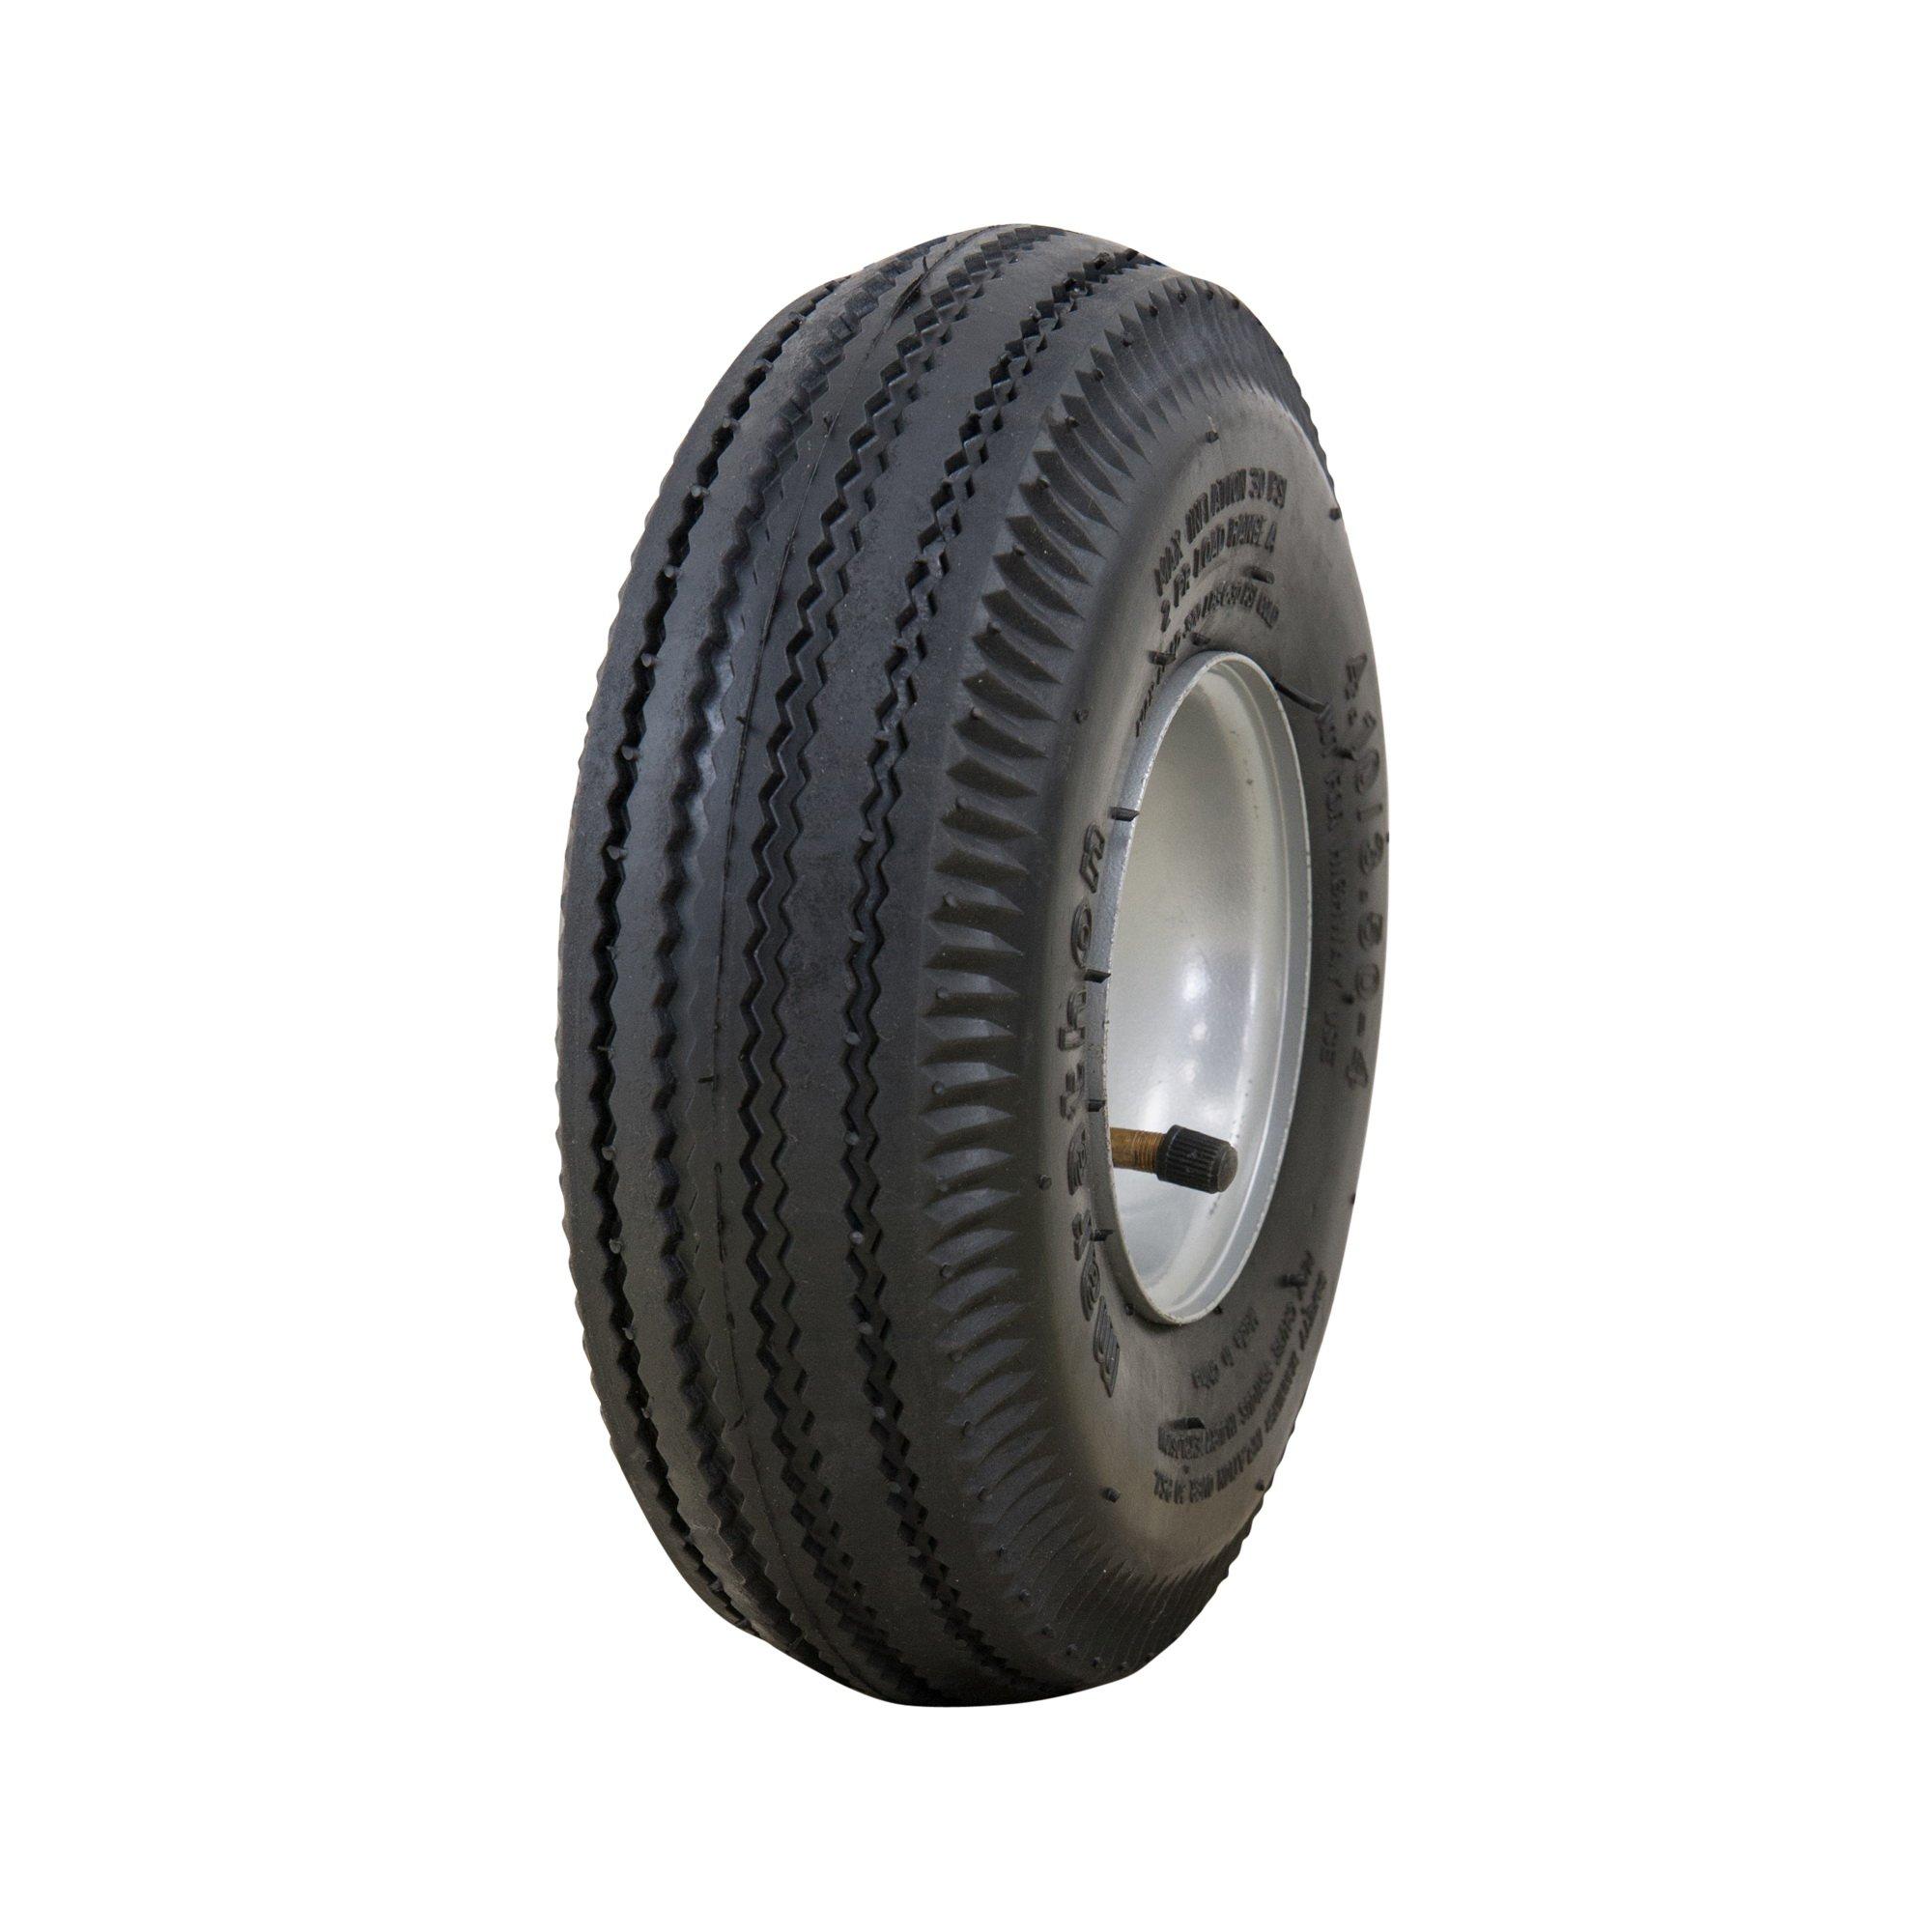 Marathon 4.10/3.50-4'' Pneumatic (Air Filled) Hand Truck/All Purpose Utility Tire on Wheel, 2.25'' Offset Hub, 3/4'' Bearings